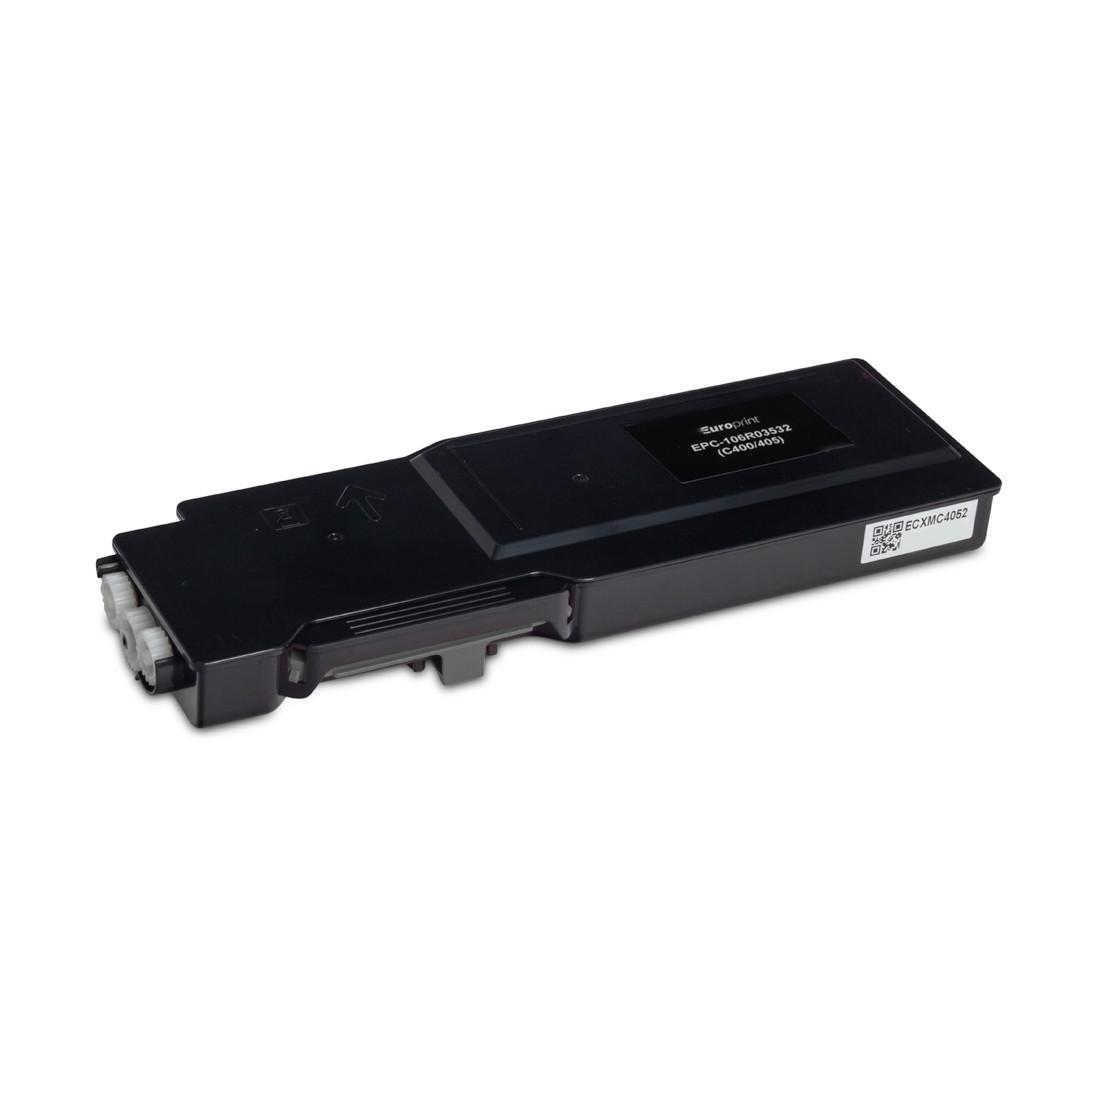 Картридж Europrint EPC-106R03532 Чёрный (C400/405)